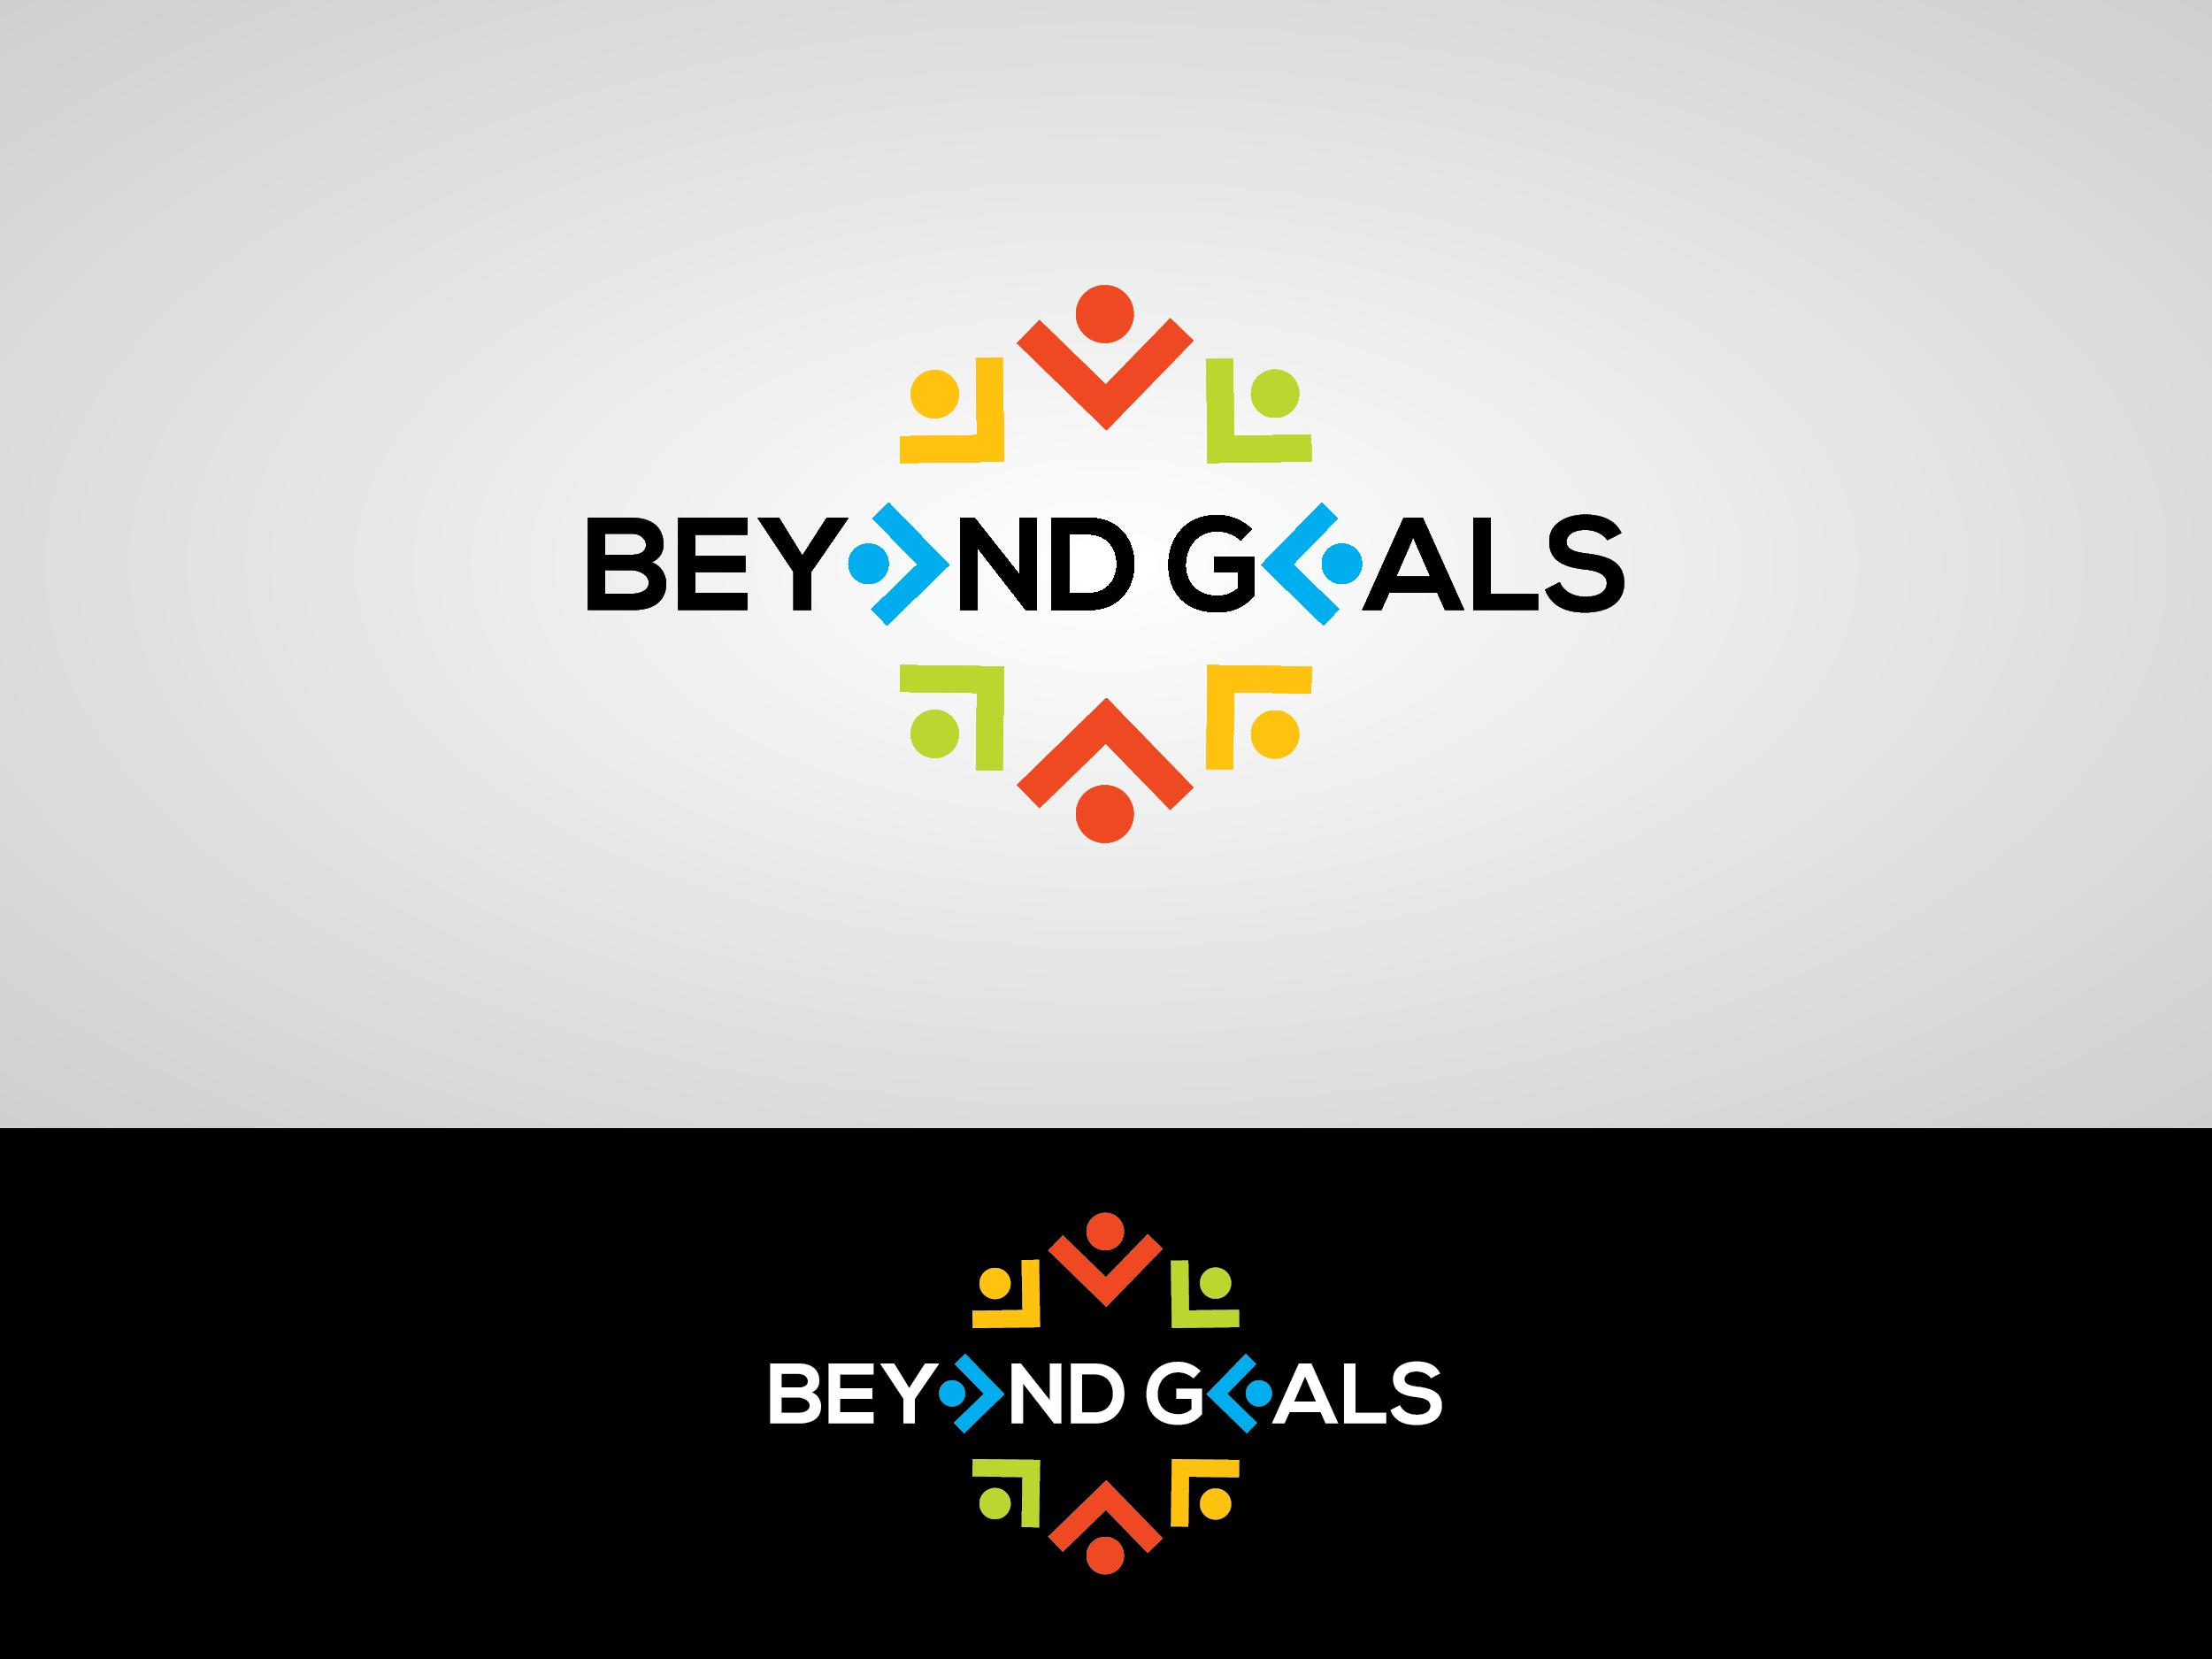 Logo Design by Shahab Uddin - Entry No. 5 in the Logo Design Contest Beyond Goals Logo Design.